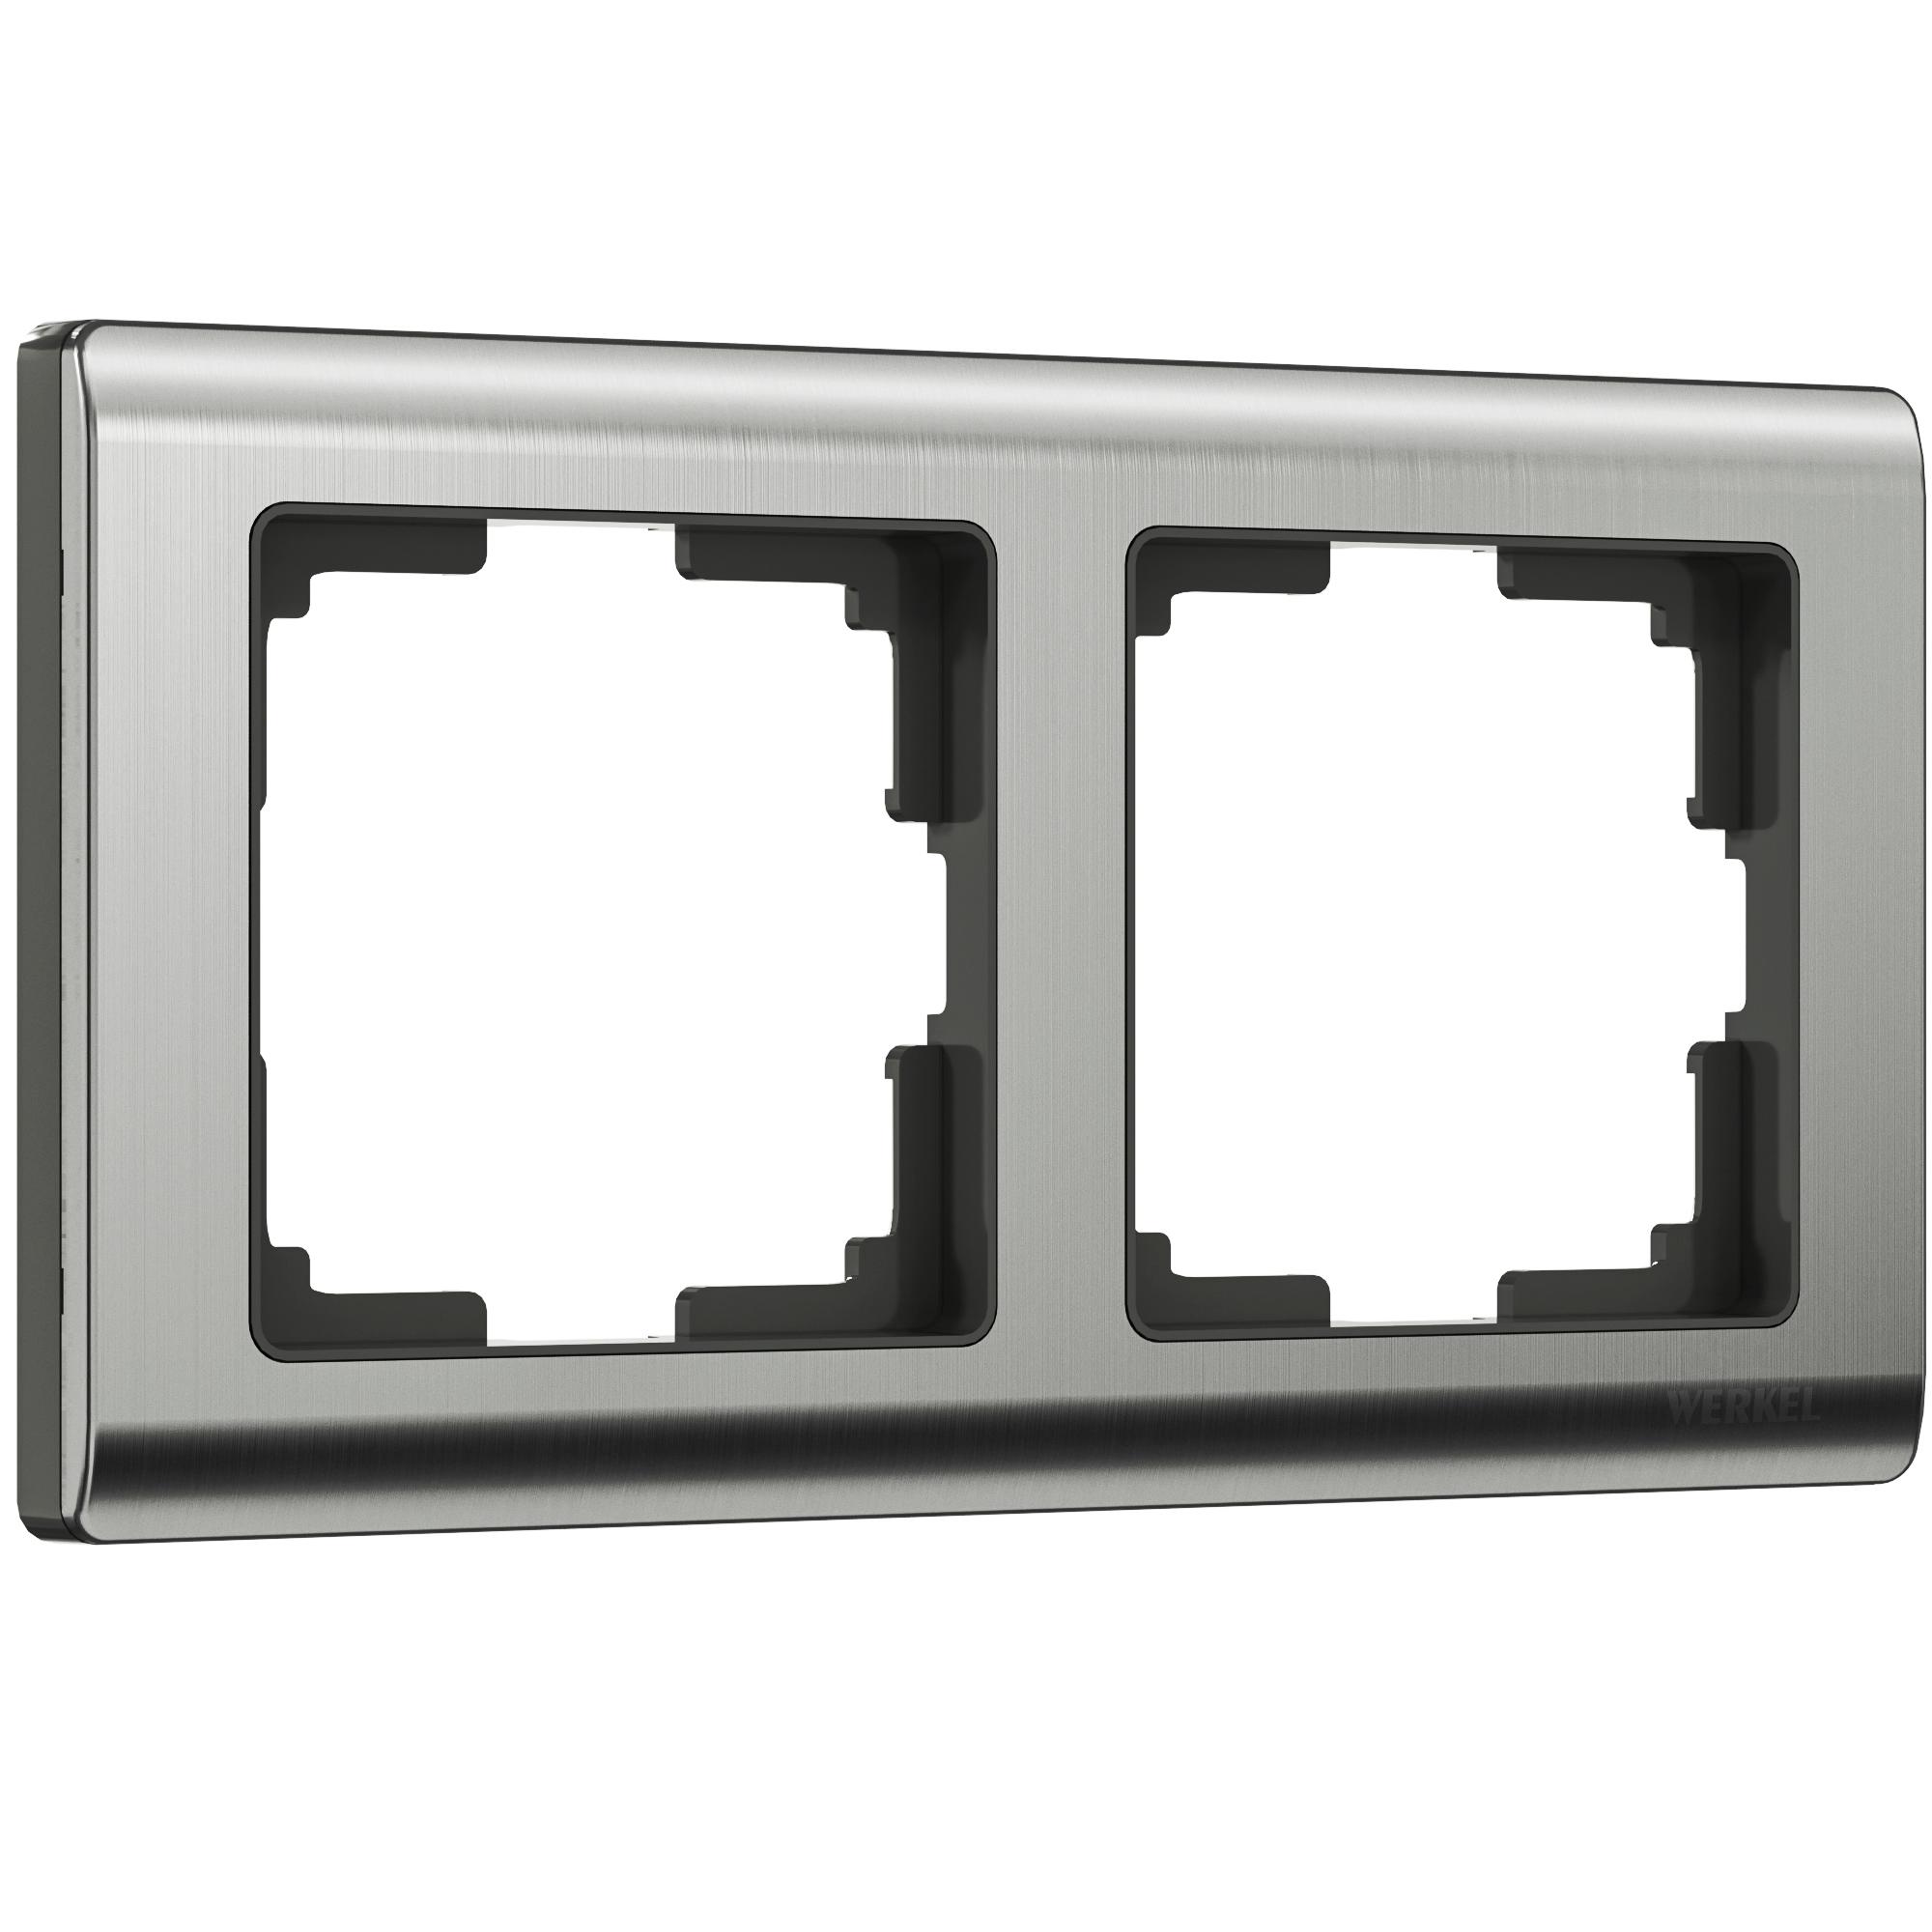 Рамка на 2 поста (глянцевый никель) W0021602